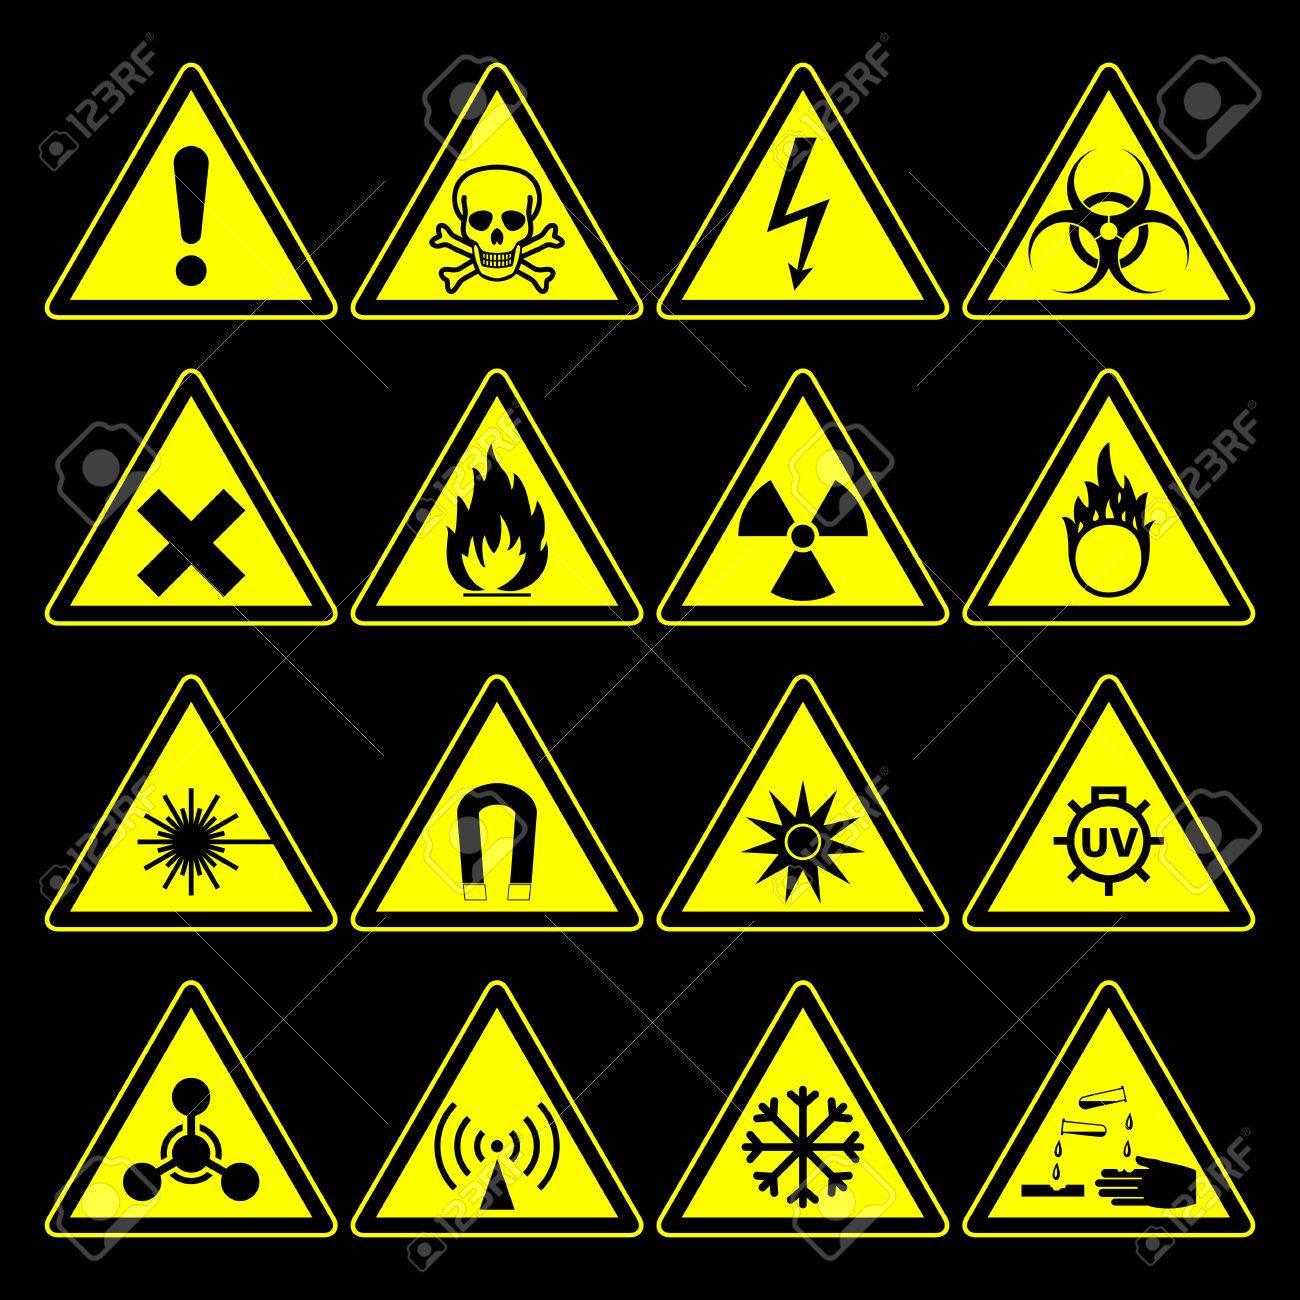 Unicode consortium looks at symbols for allergies slashdot re score3 buycottarizona Choice Image